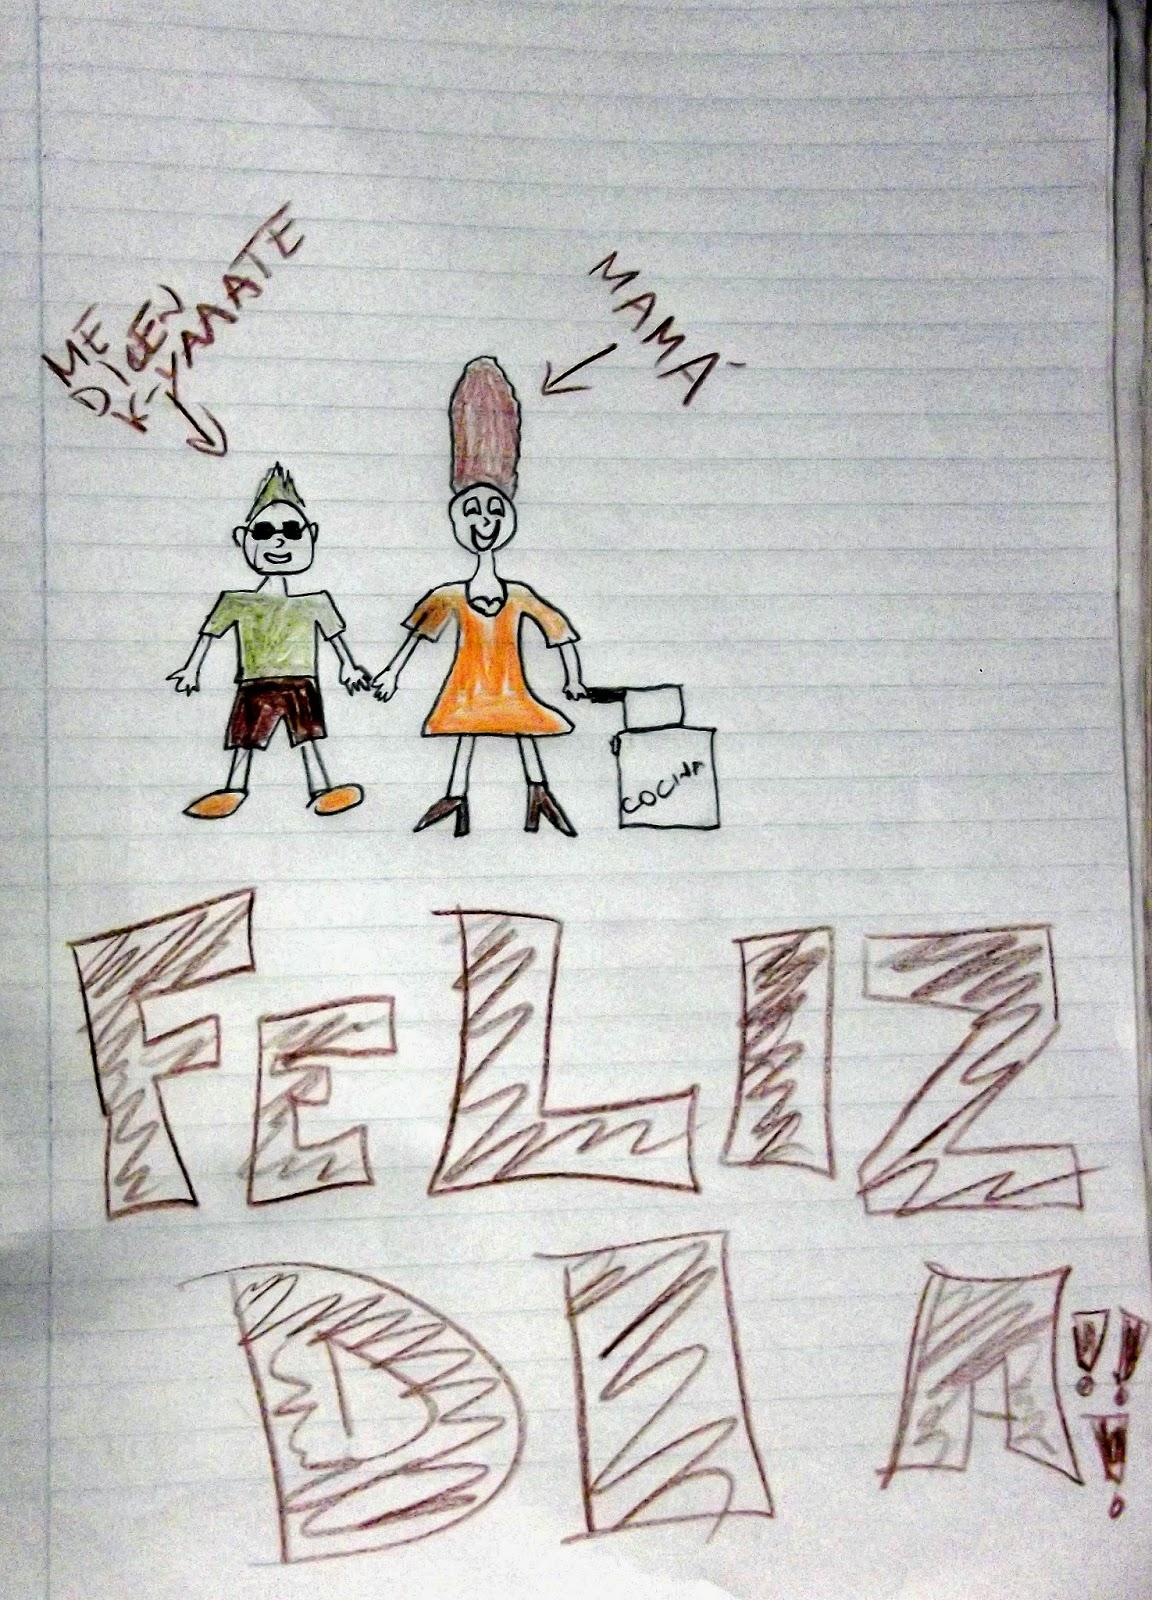 dibujo del dia de la madre me dicen k-yaaate feliz dia mama